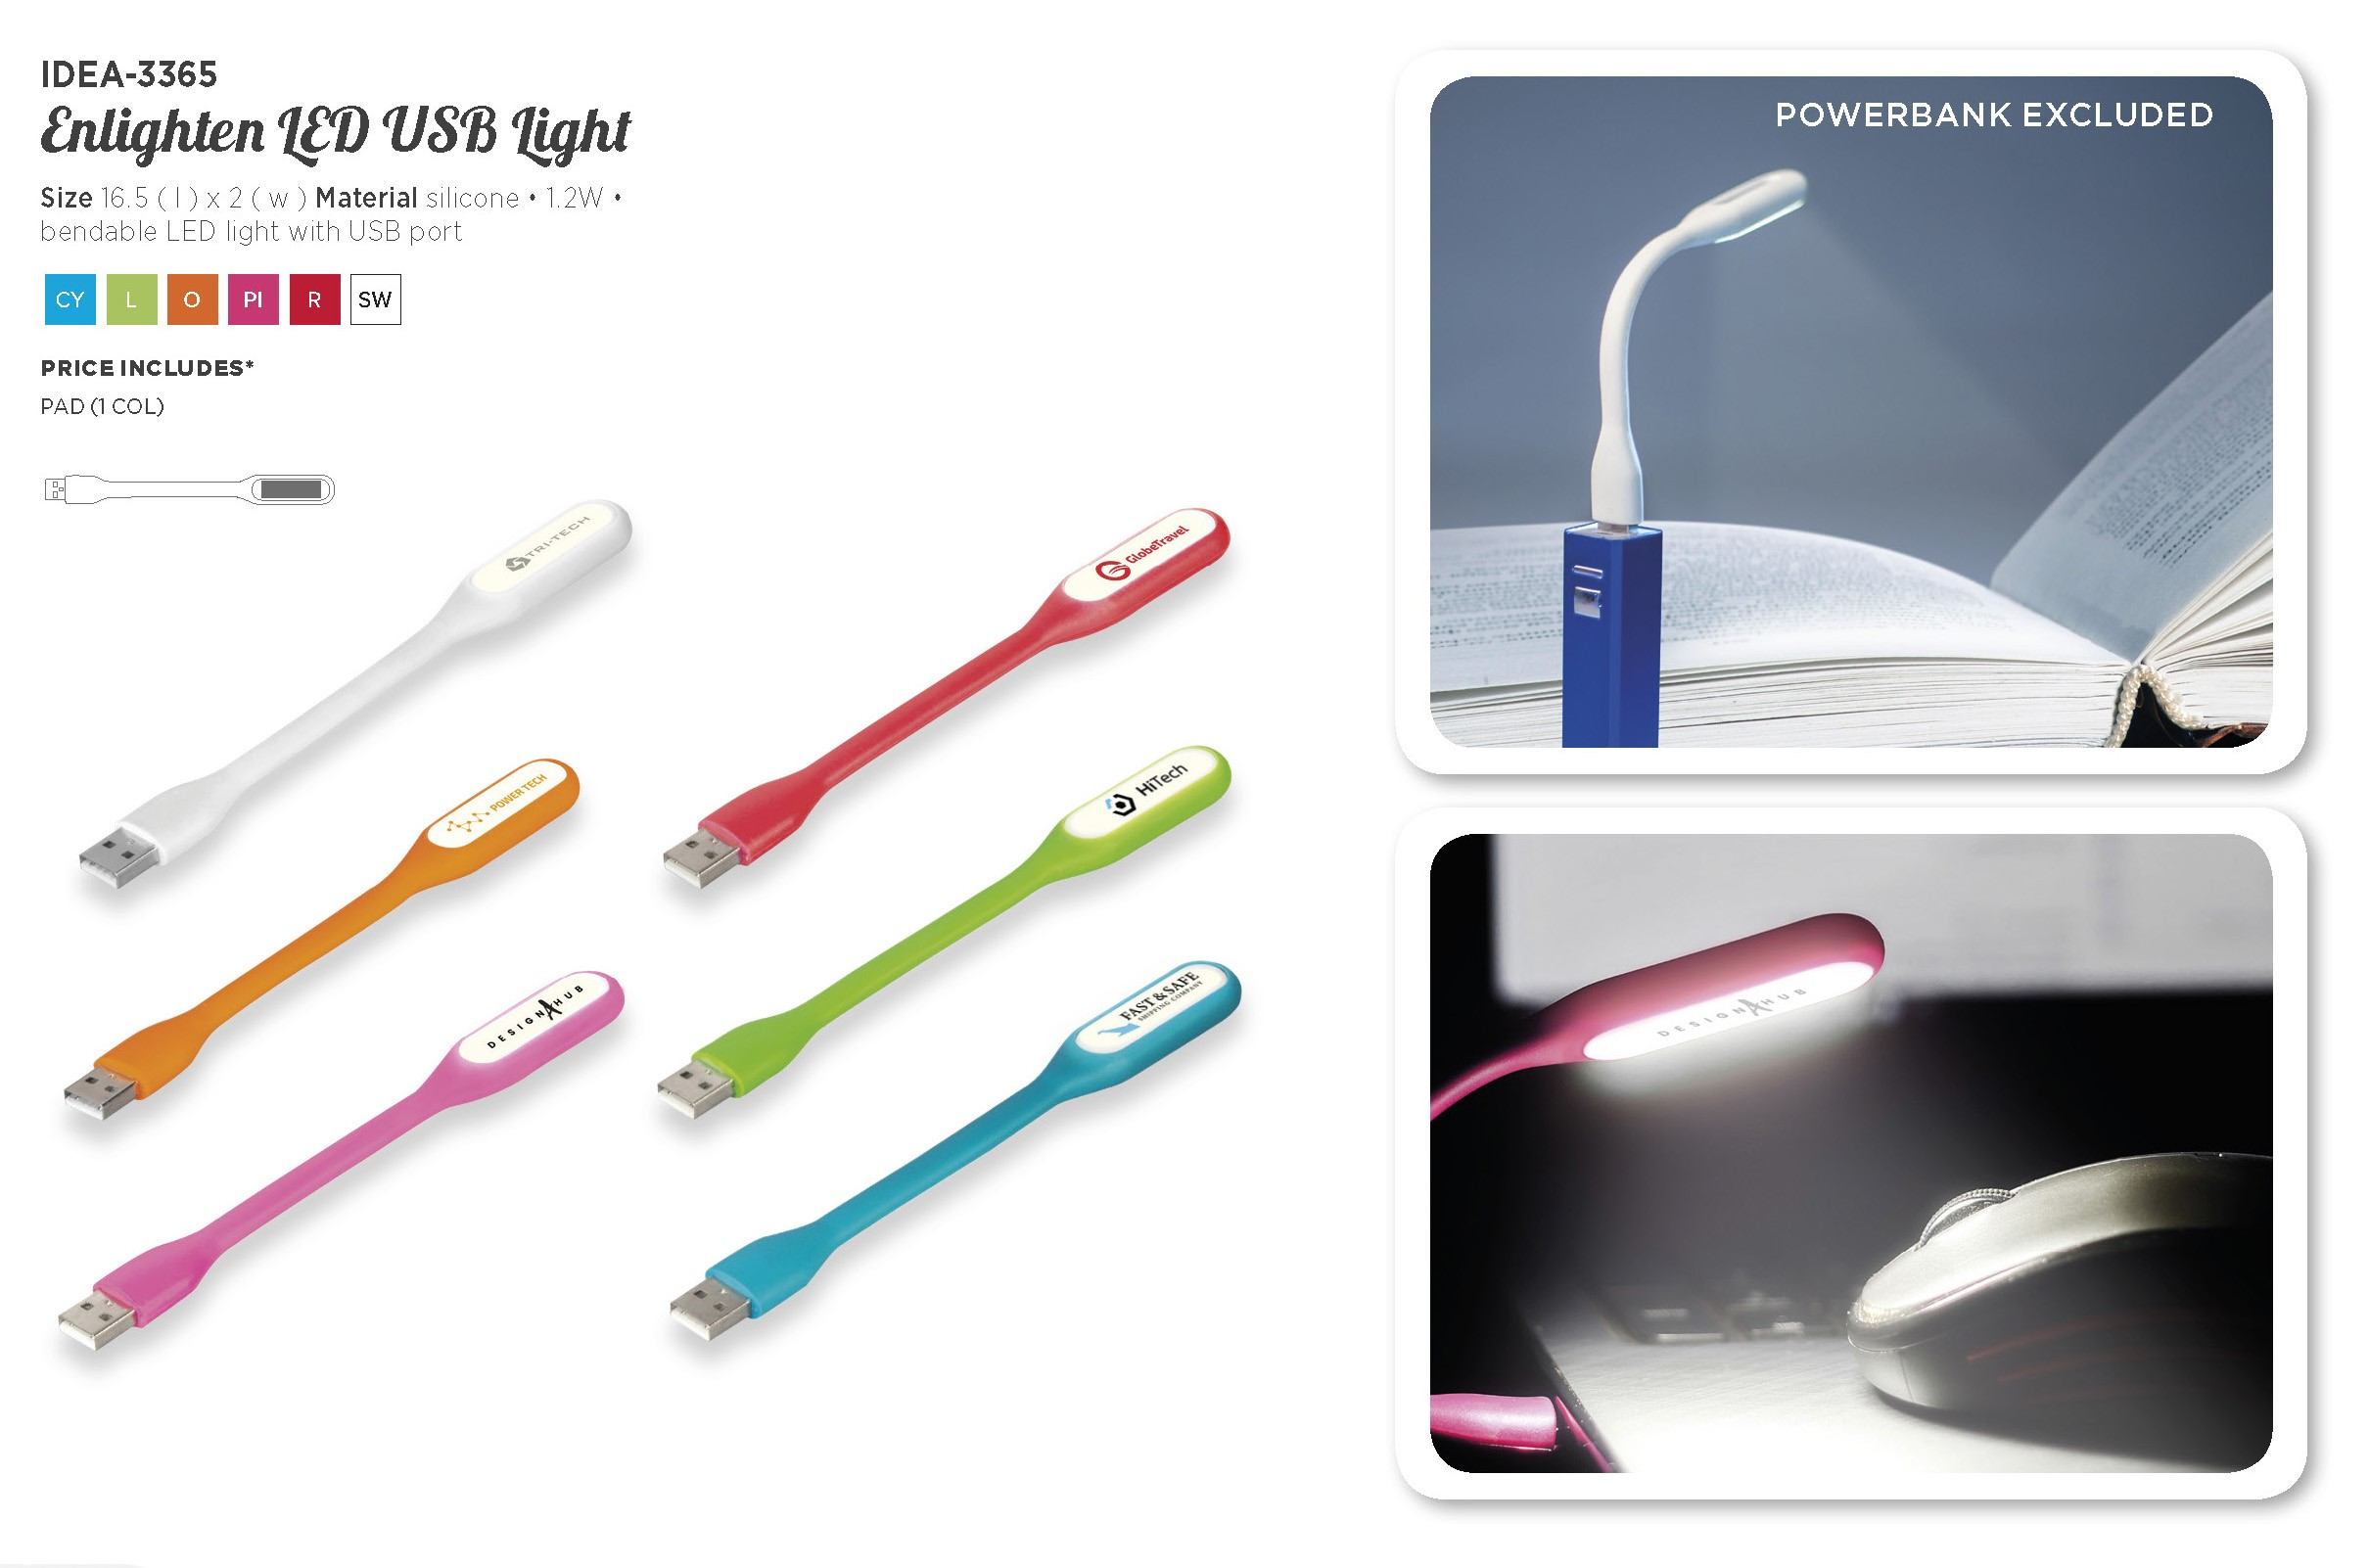 Product: LED USB Light